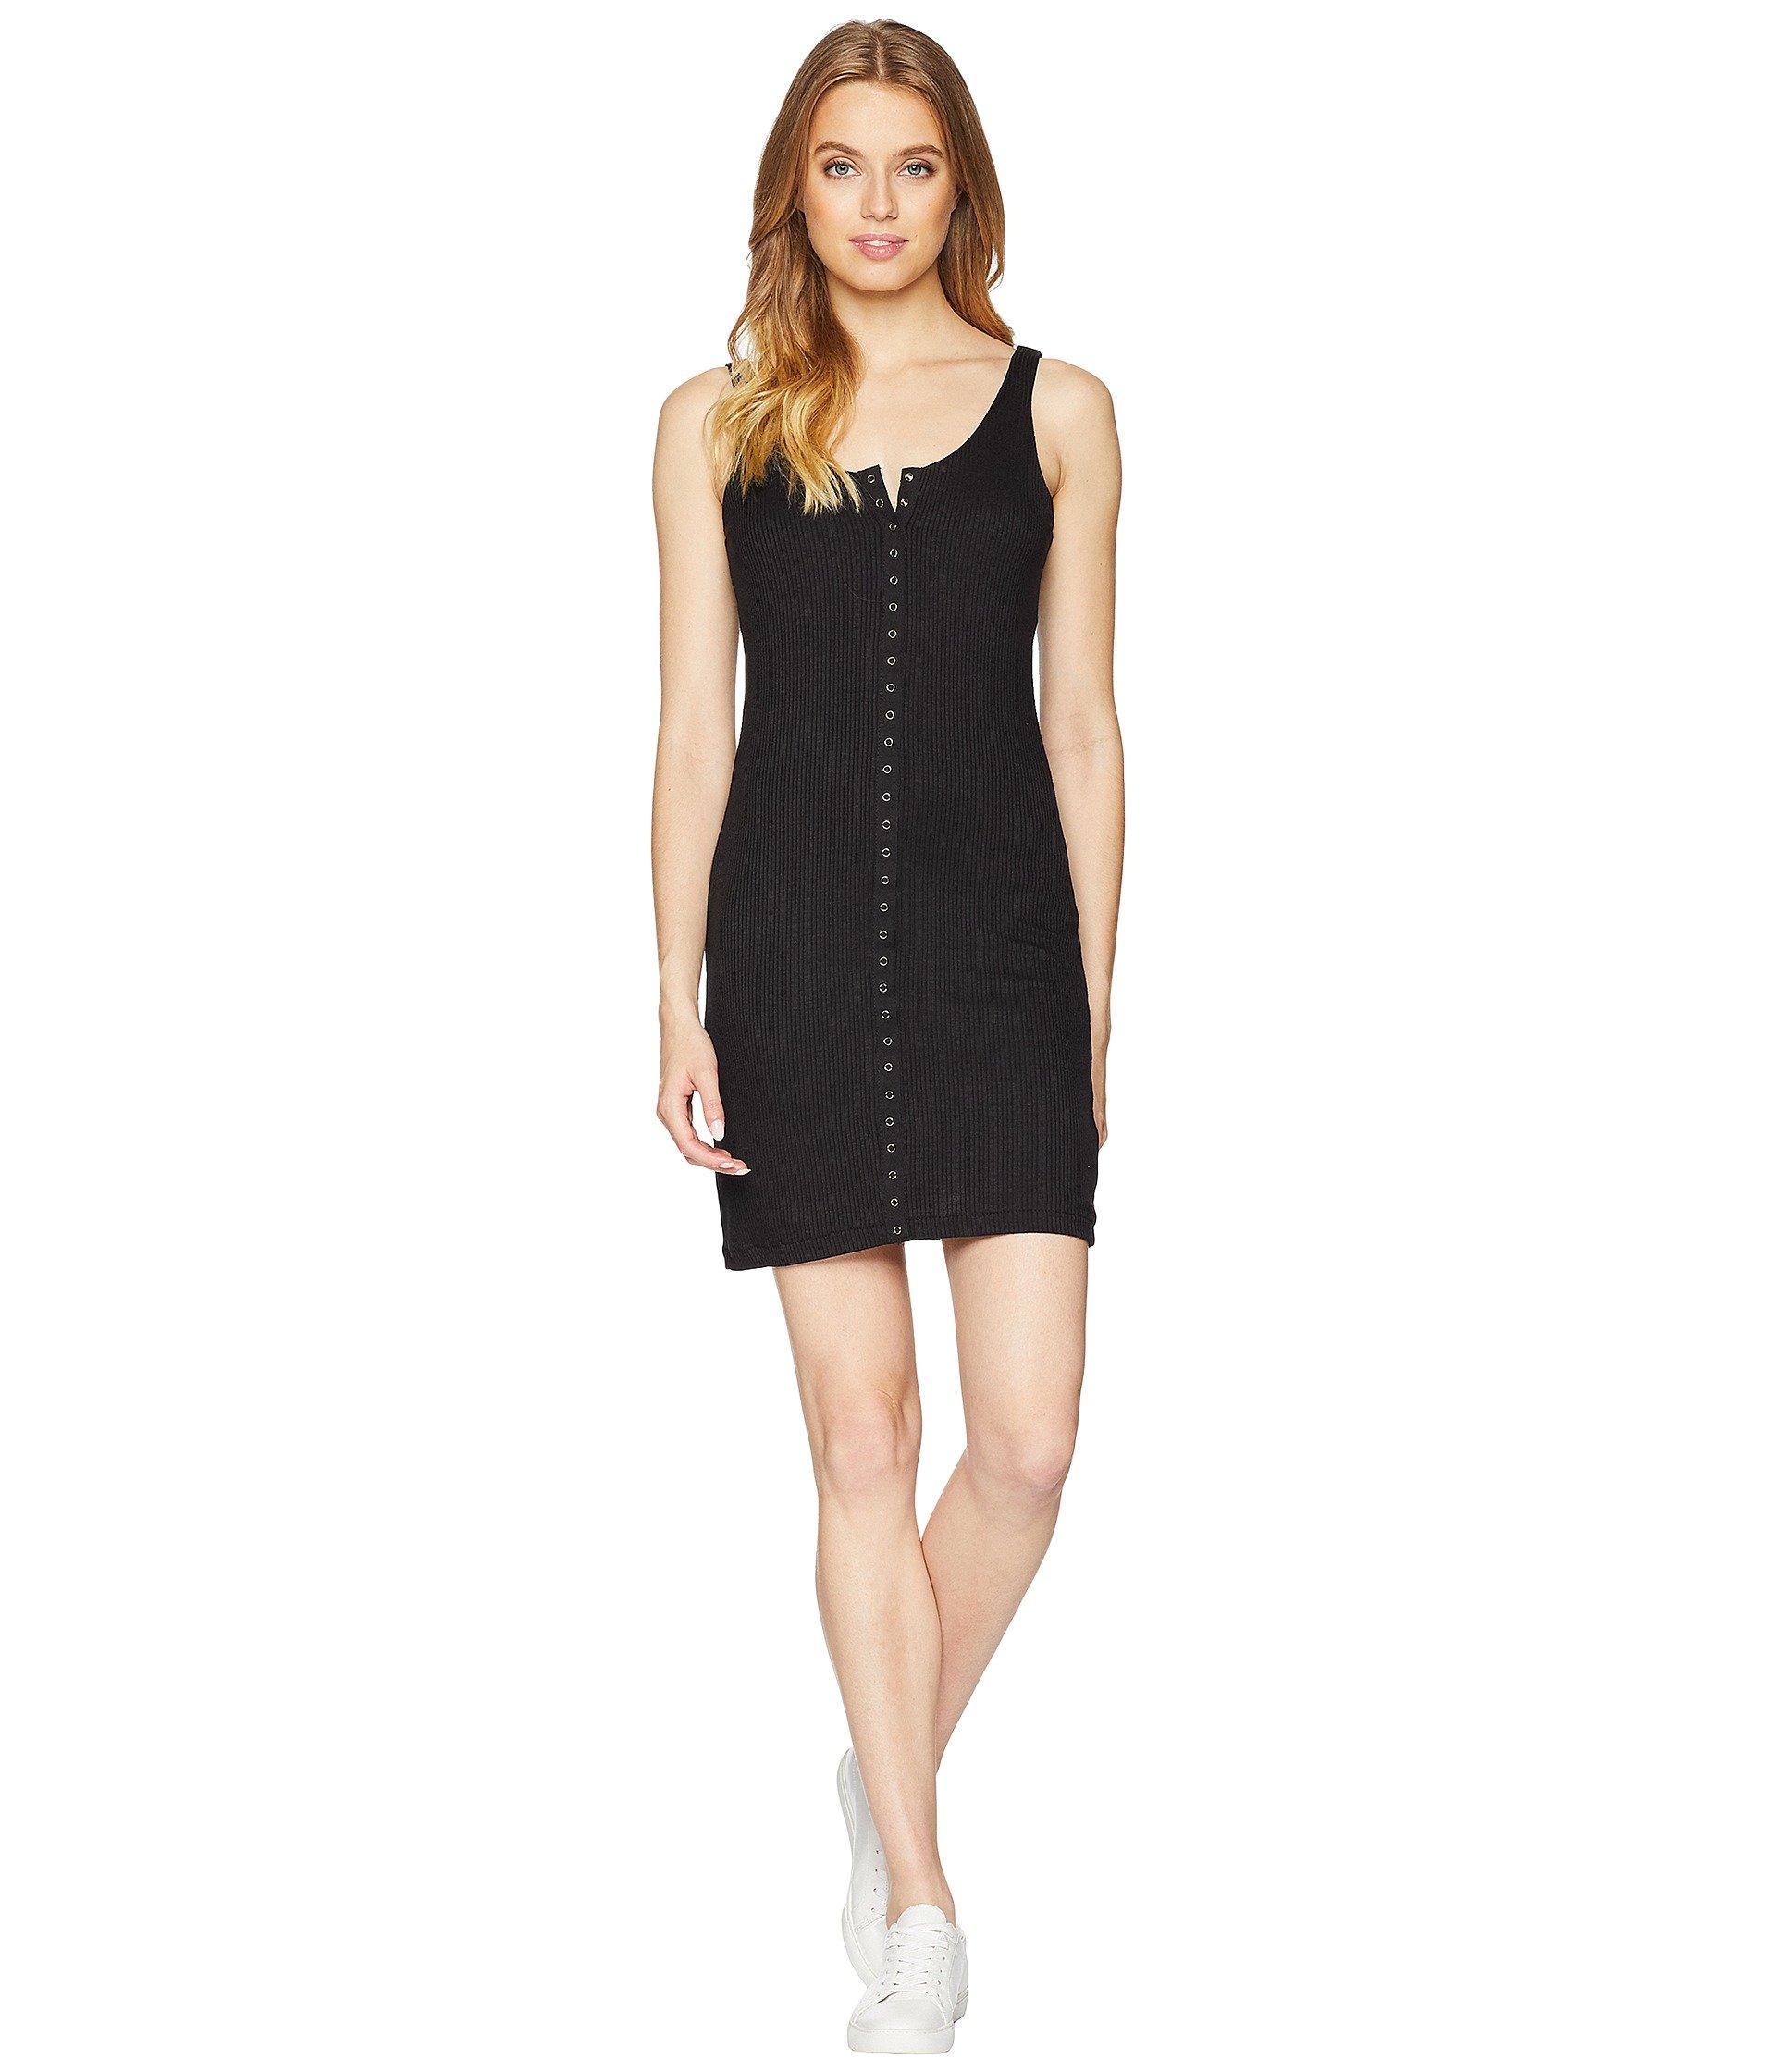 Lucy Love Women's Snap It up Dress Black Large